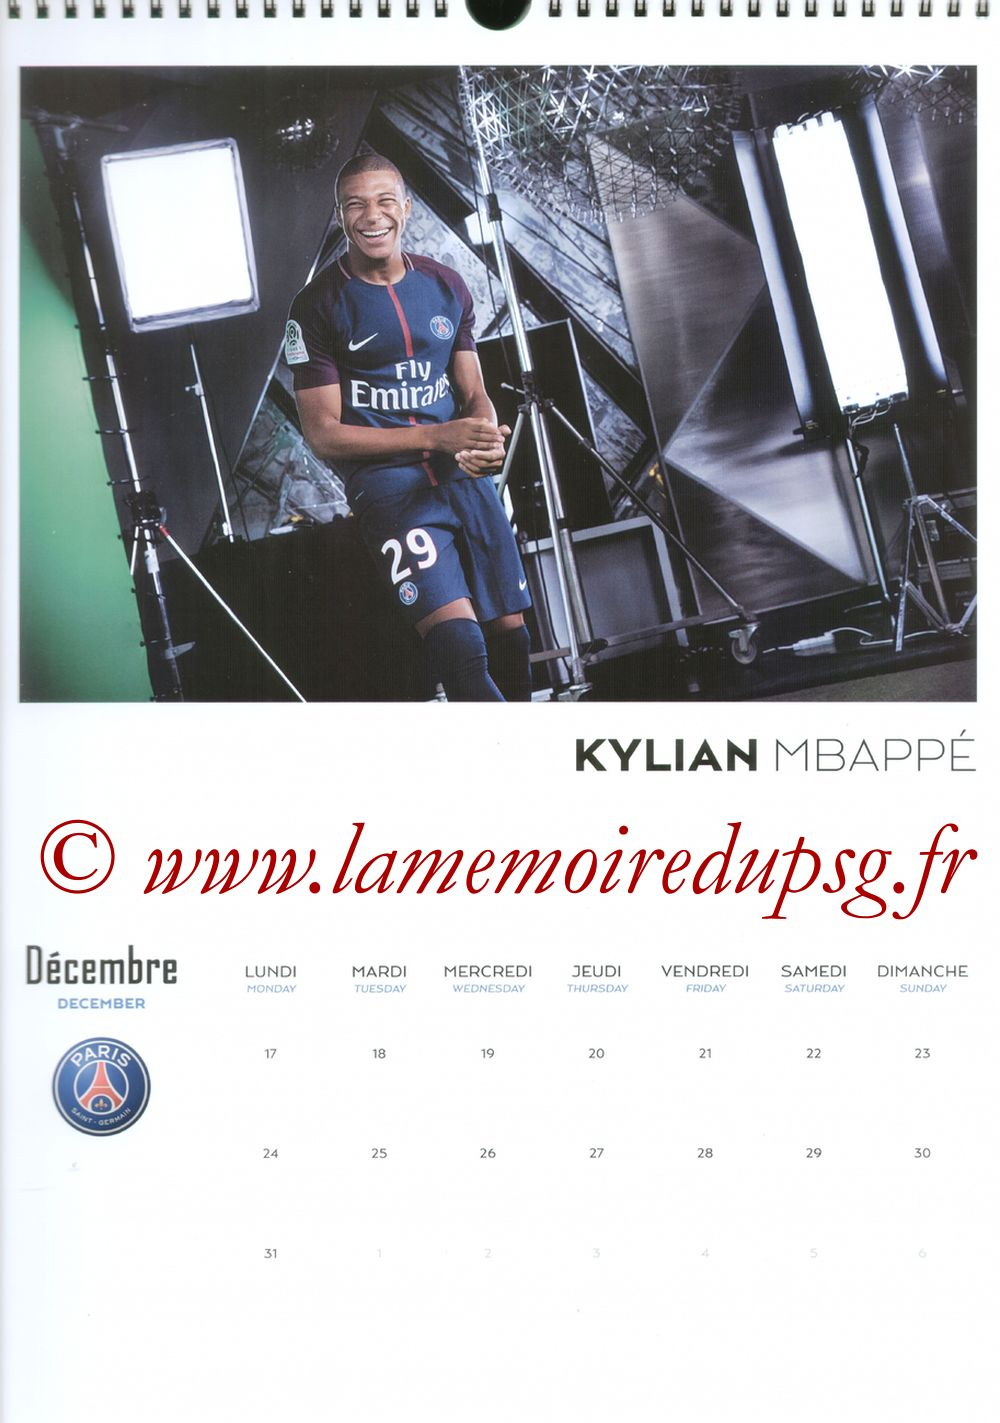 Calendrier PSG 2018 - Page 24 - Killian M'BAPPE